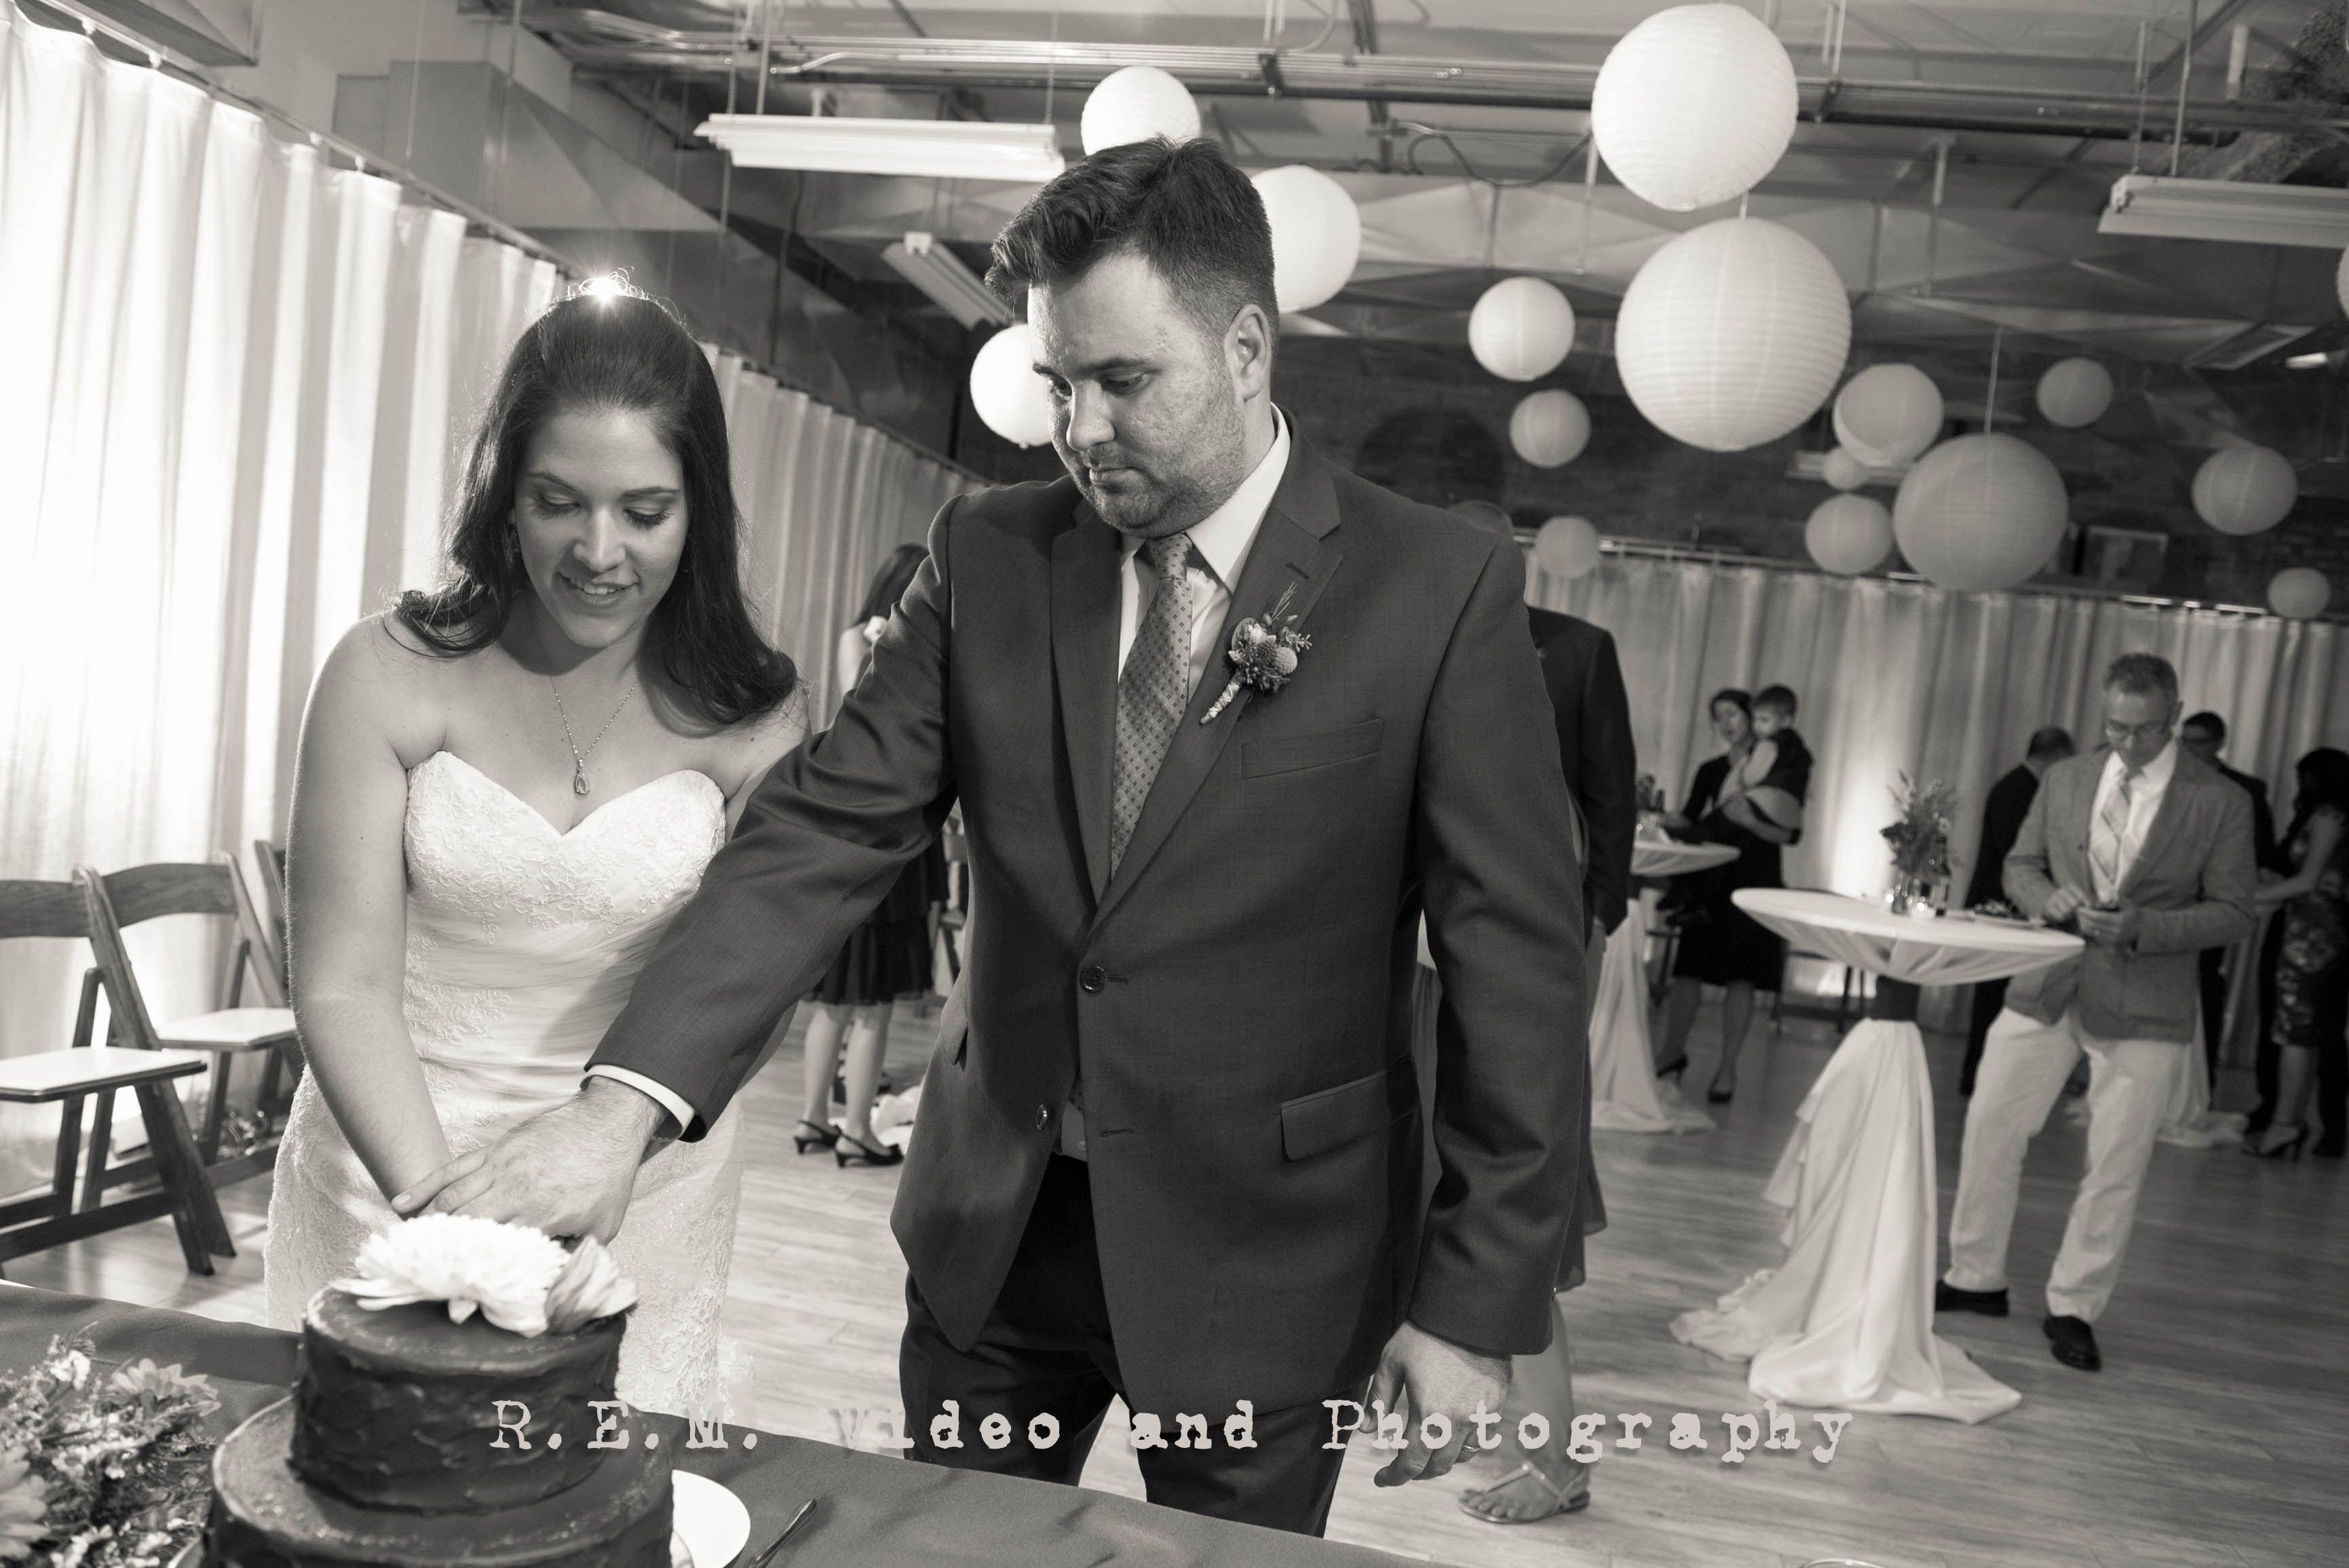 The first cut of their cake. R.E.M. Wedding. www.remvp.com